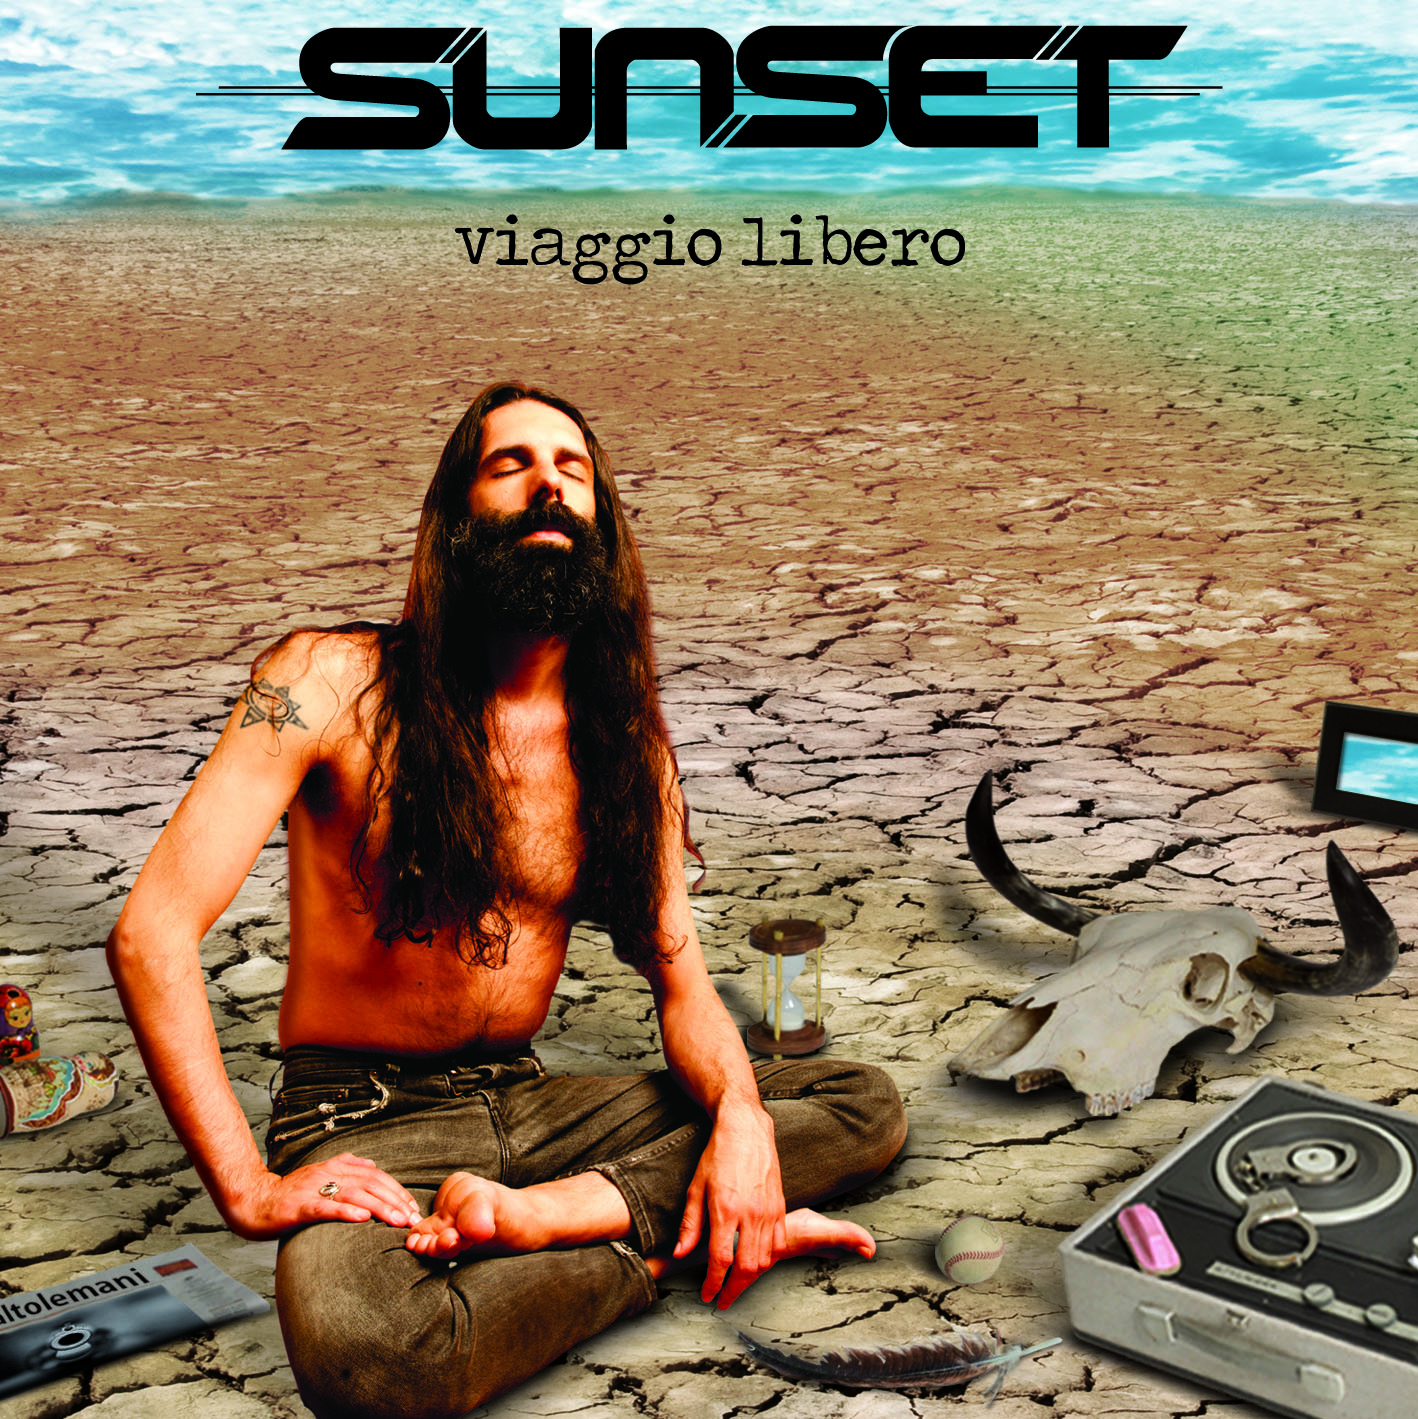 Sunset- Viaggio Libero